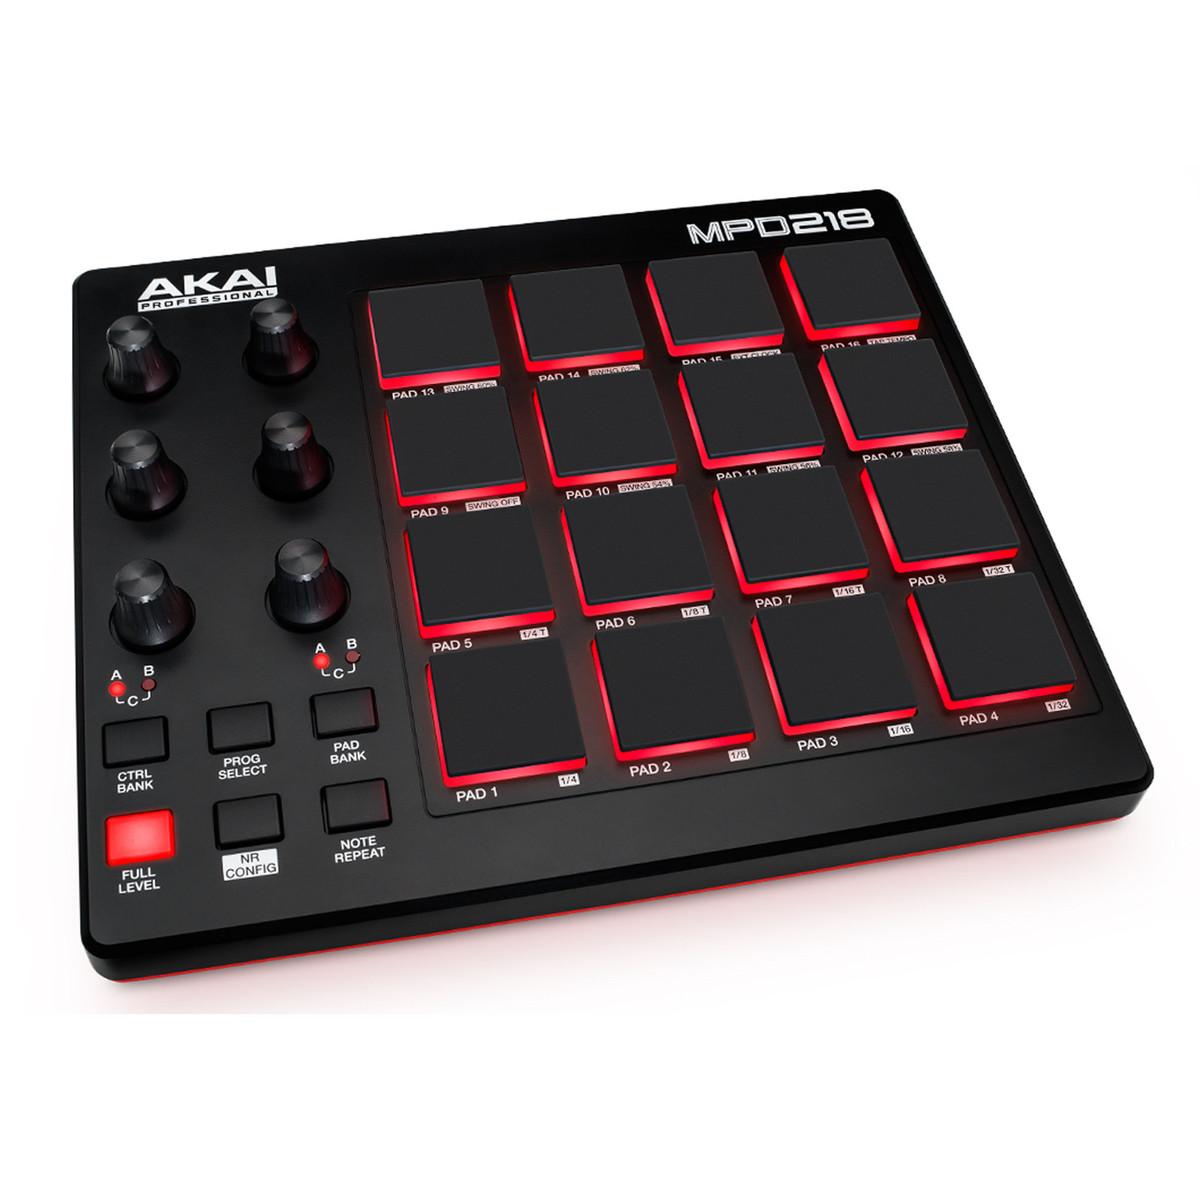 akai mpd218 pad controller b stock at gear4music. Black Bedroom Furniture Sets. Home Design Ideas